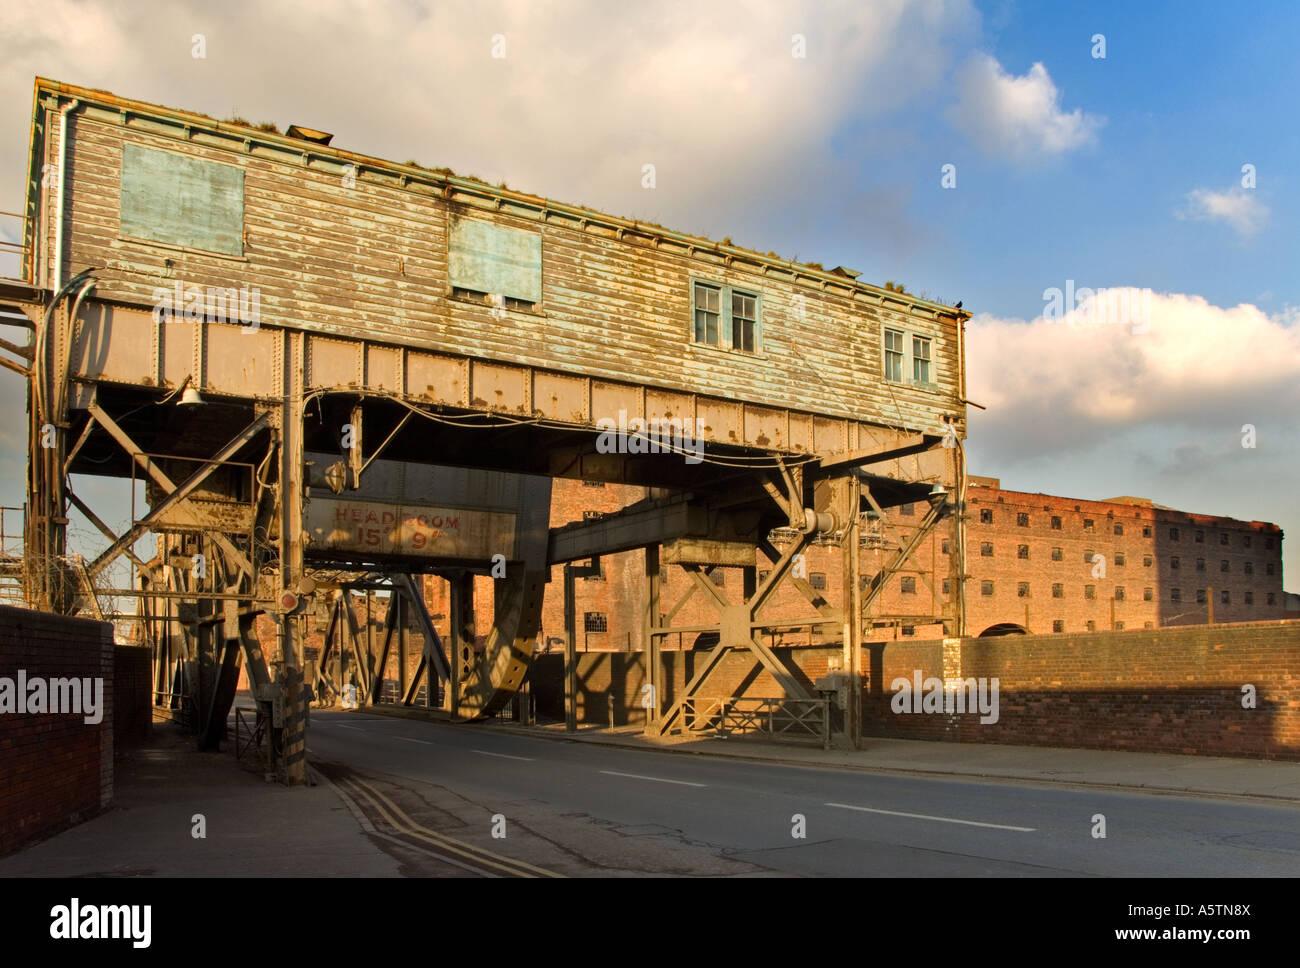 Old Swingbridge Connecting Stanley Dock with the River Mersey, Liverpool, Merseyside, England, UK Stock Photo